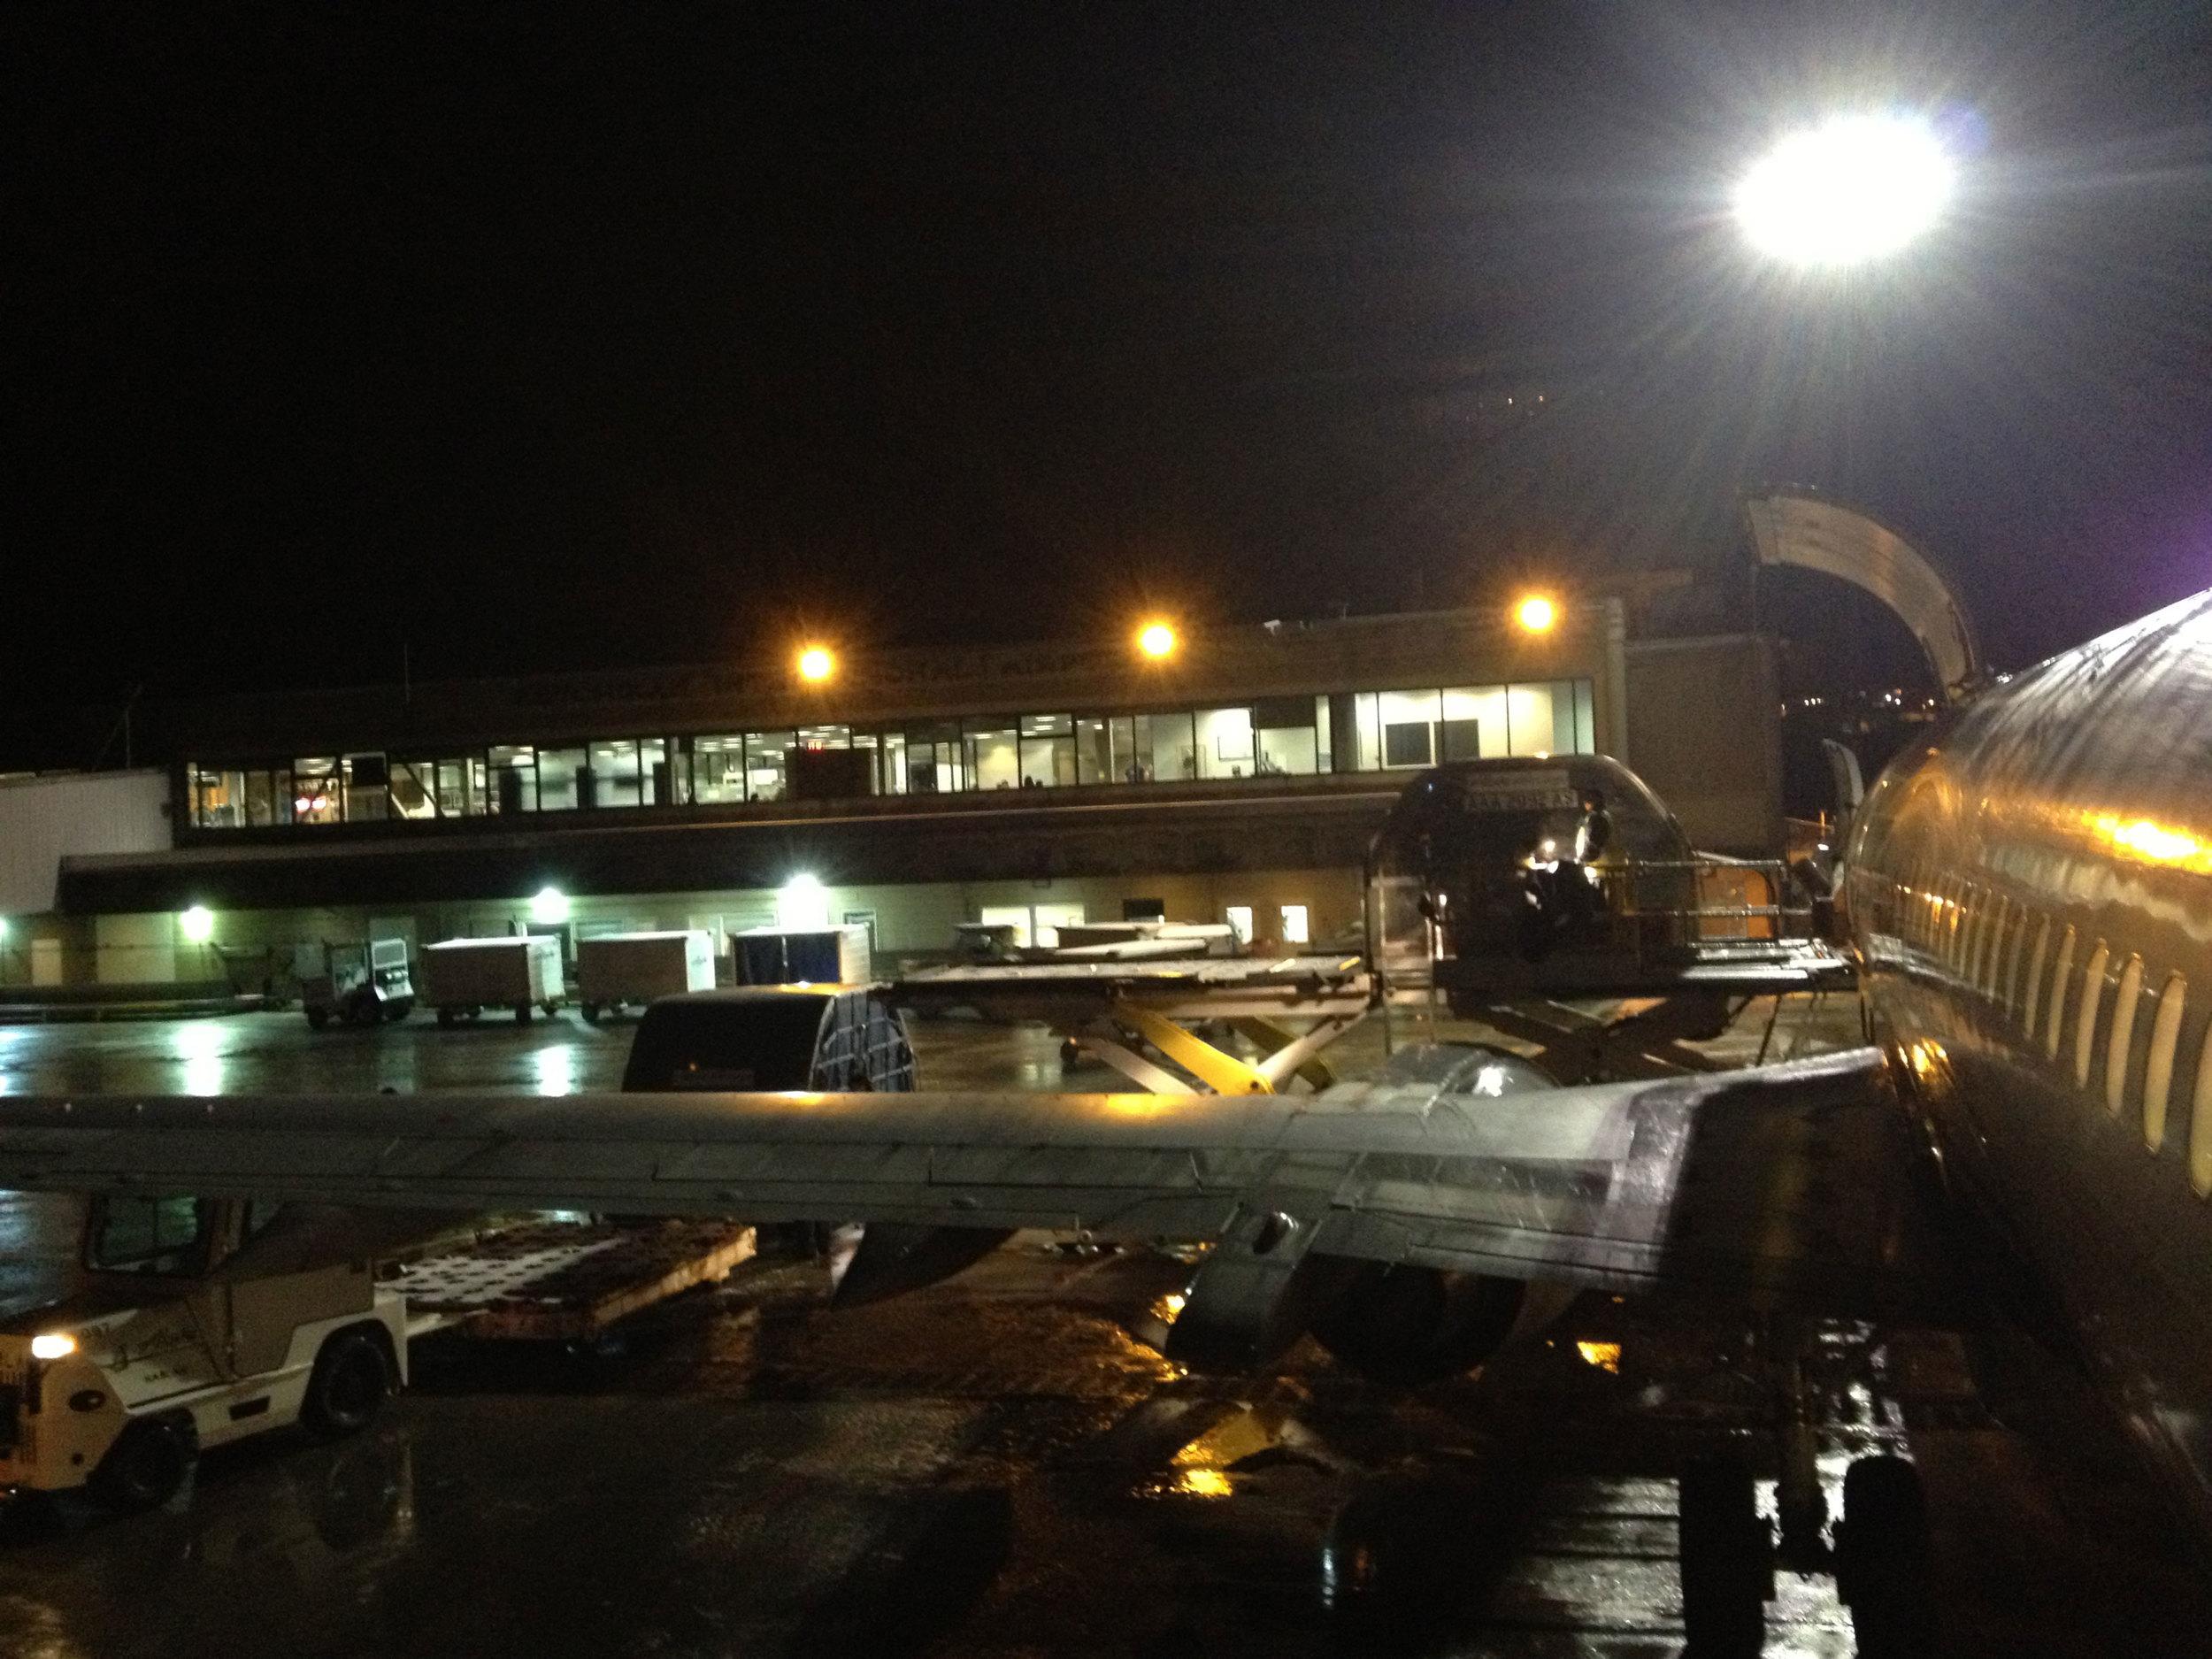 Ketchikan International Airport